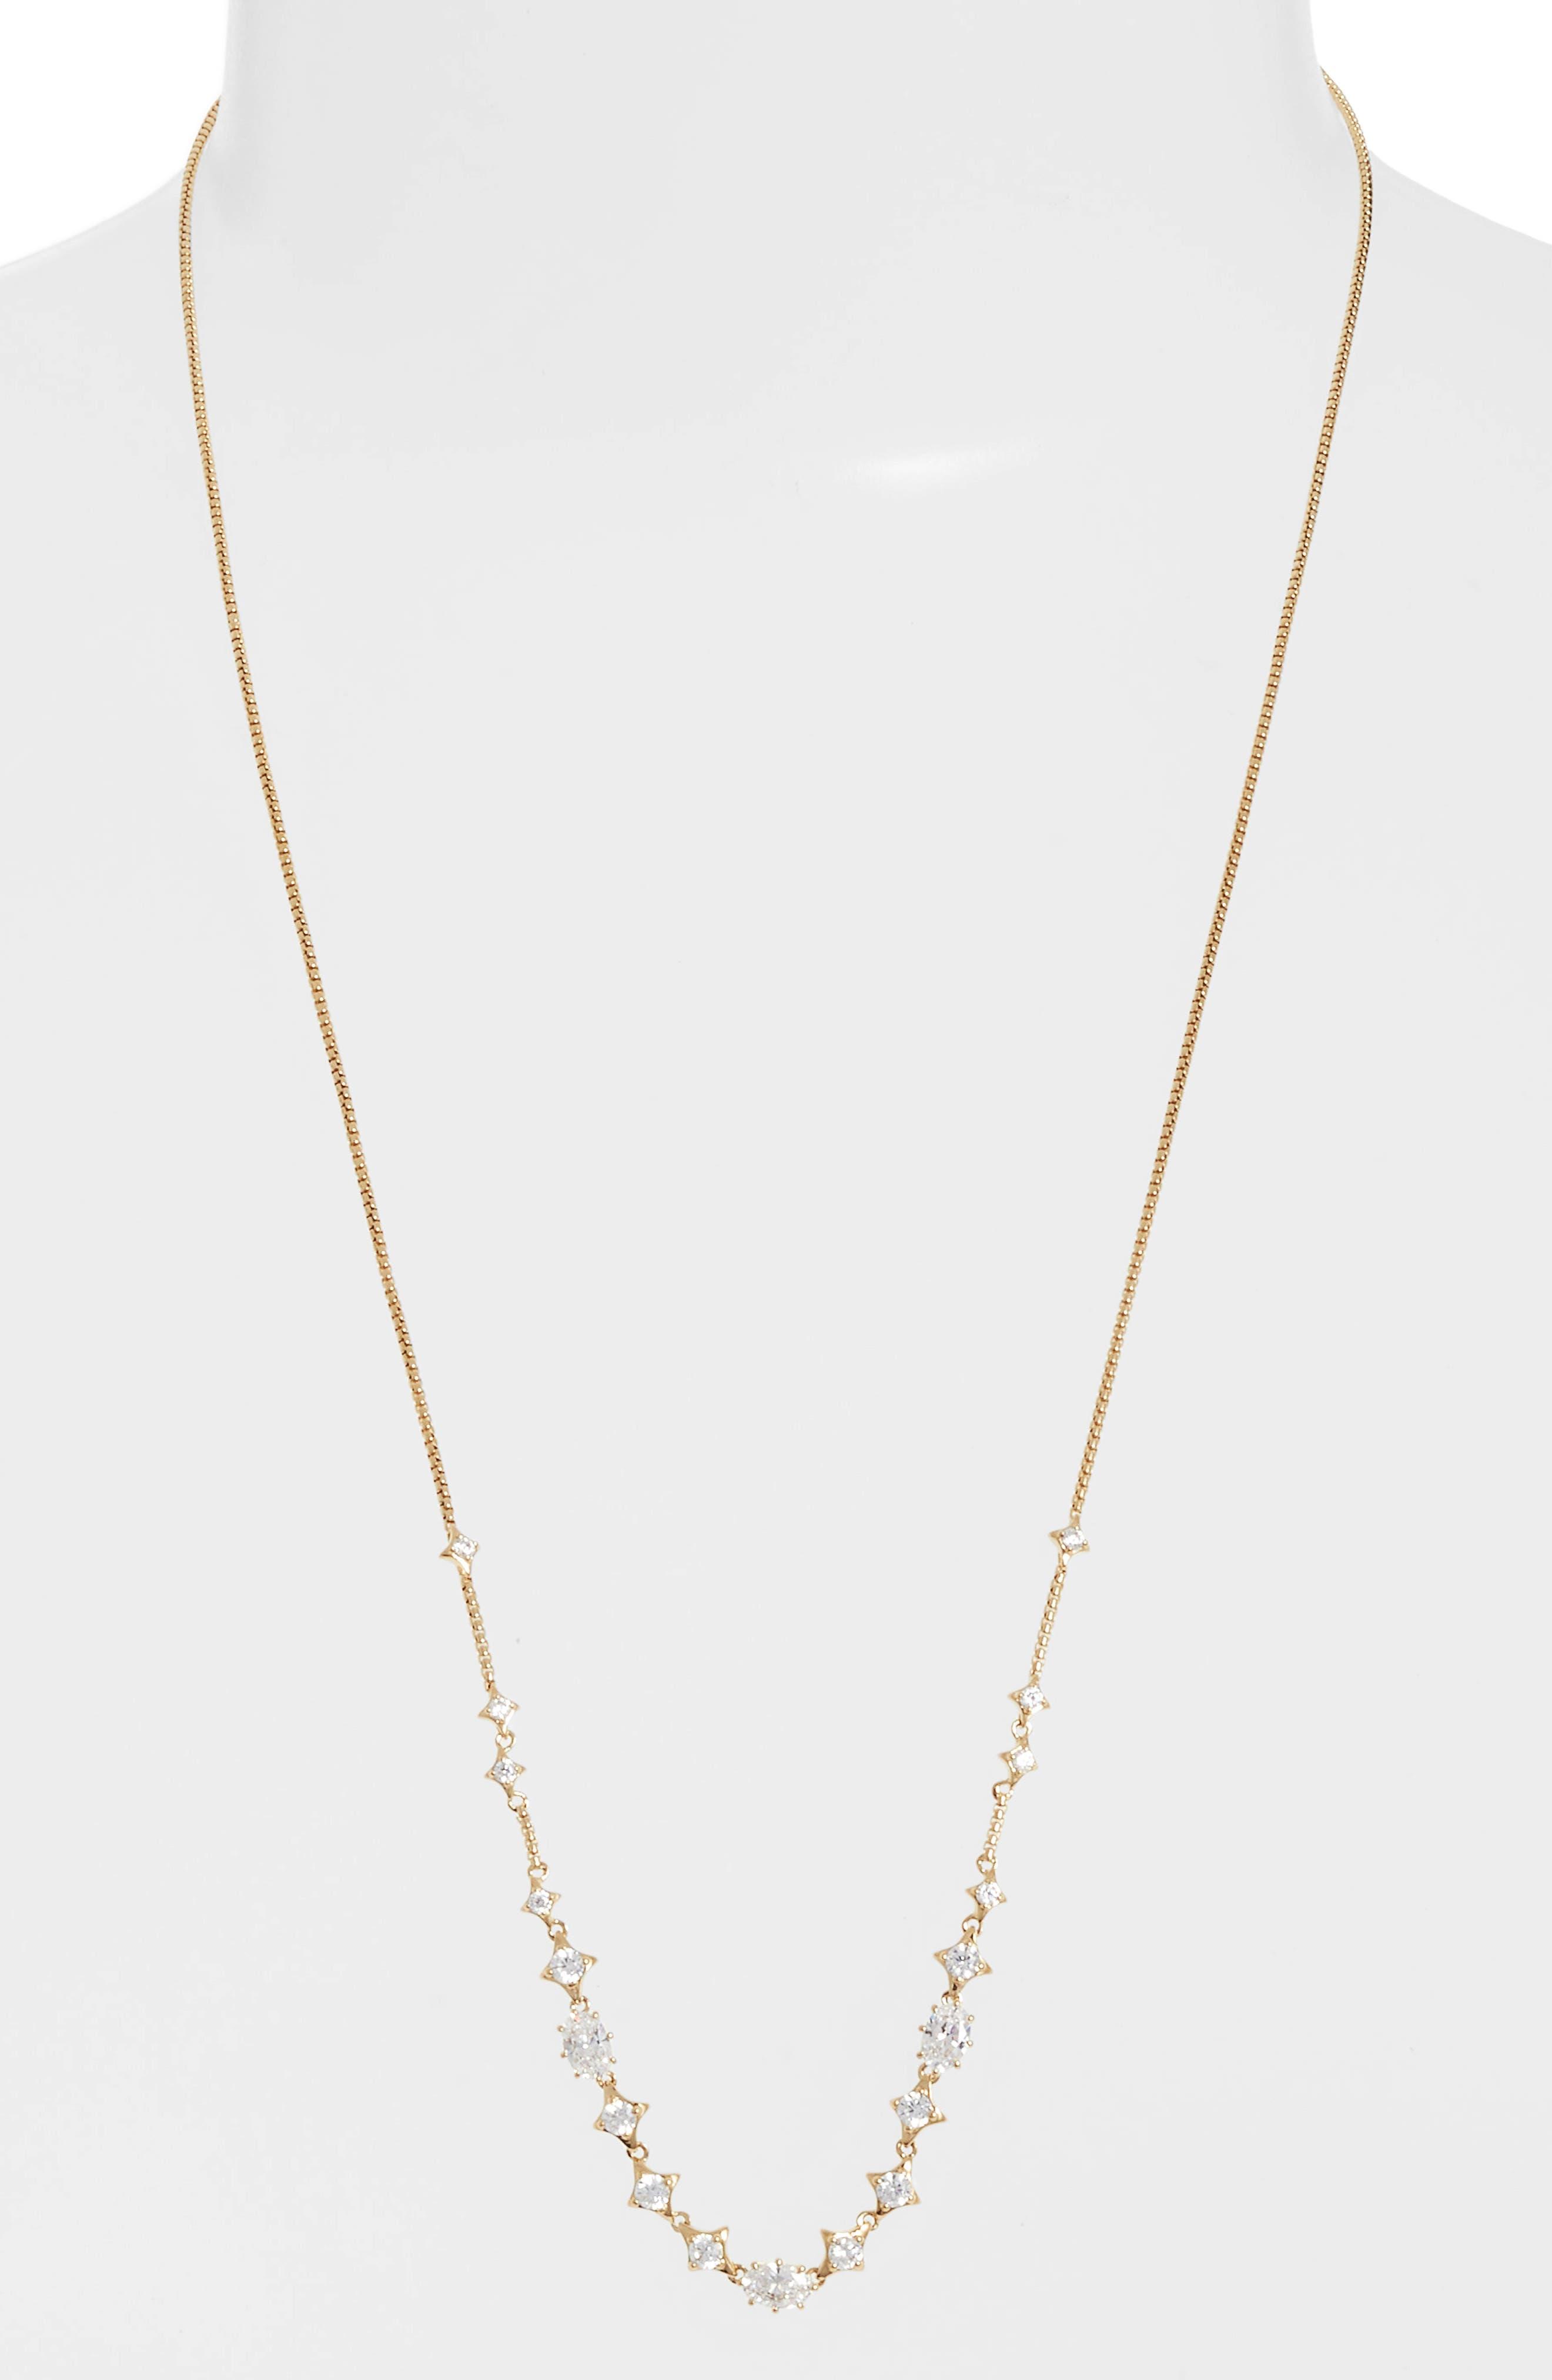 Boho Cubic Zirconia Necklace,                             Main thumbnail 3, color,